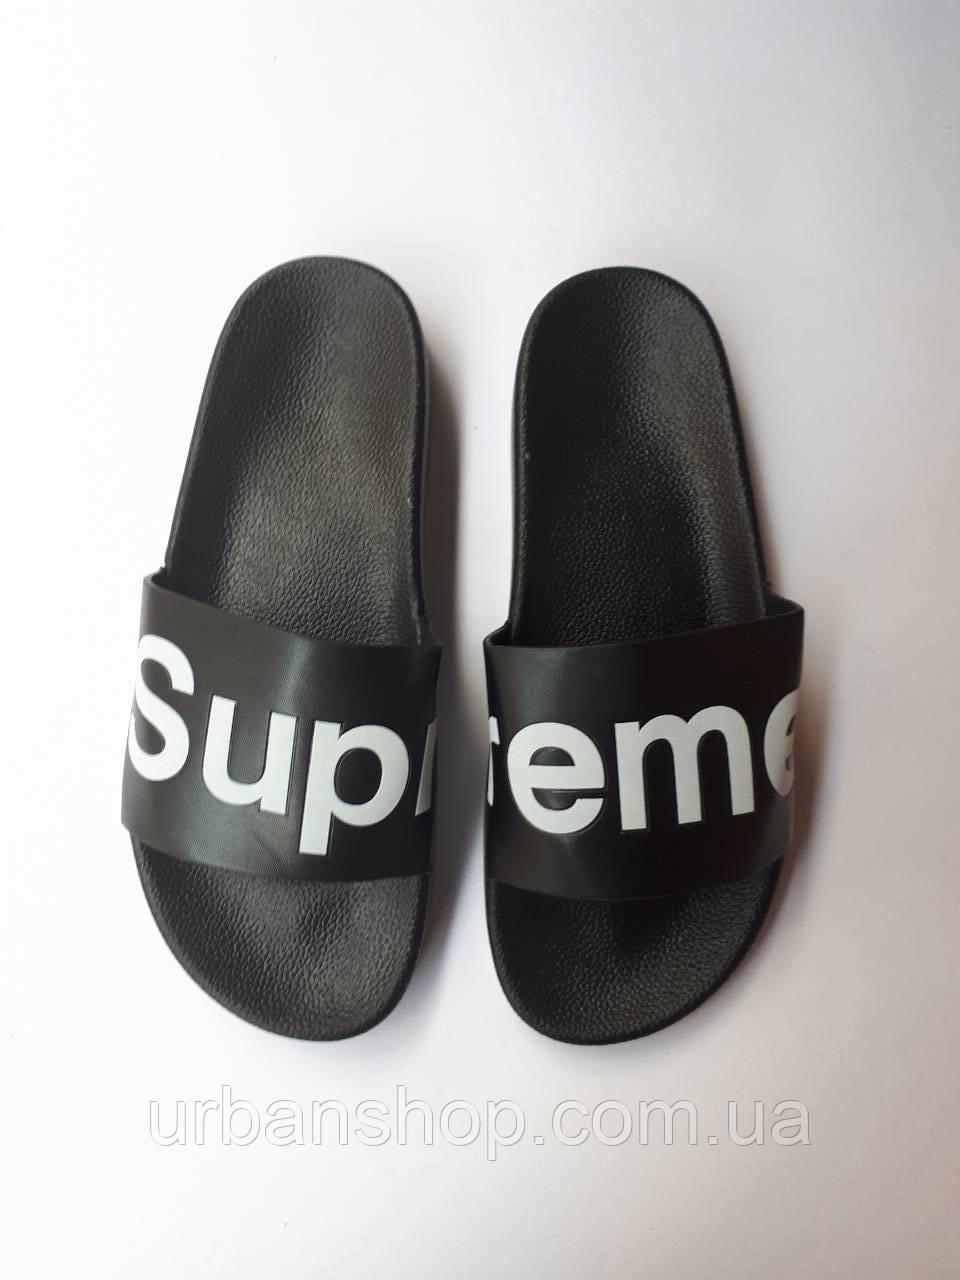 Supreme Slippers Black